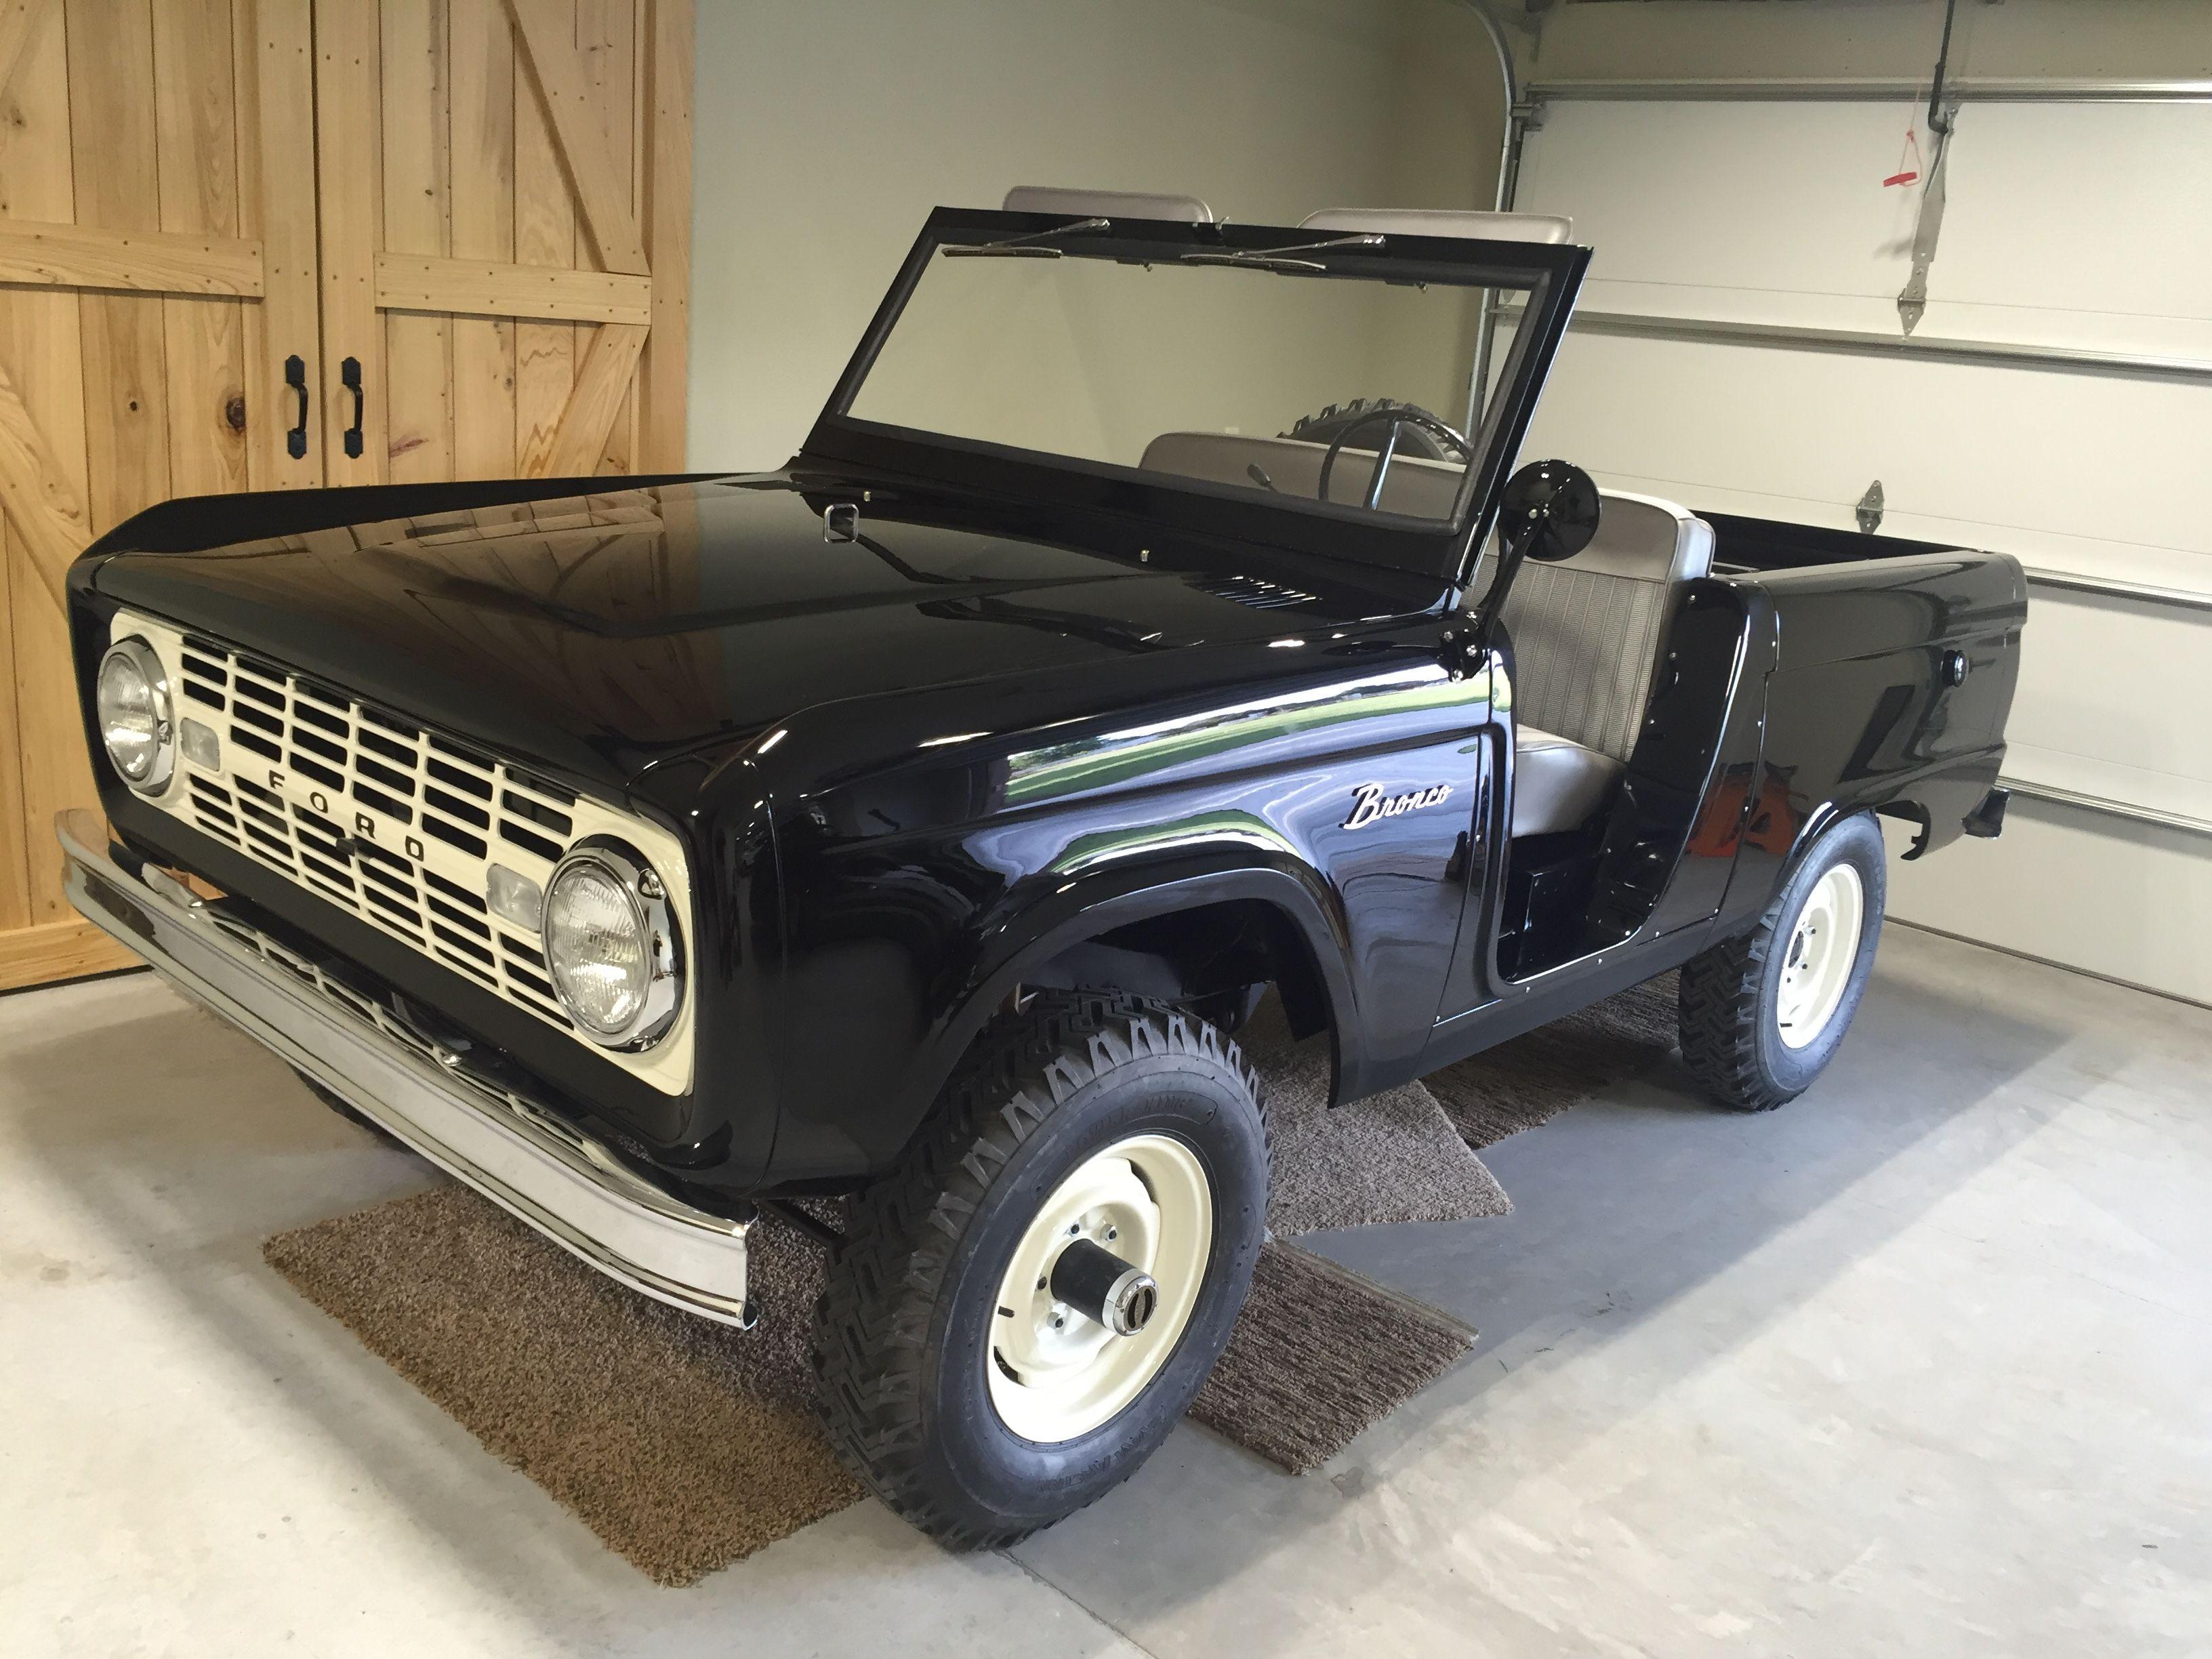 1966 bronco u13 raven black august 1965 build classic broncoblack truckearly broncoford broncomuscle carsvintage